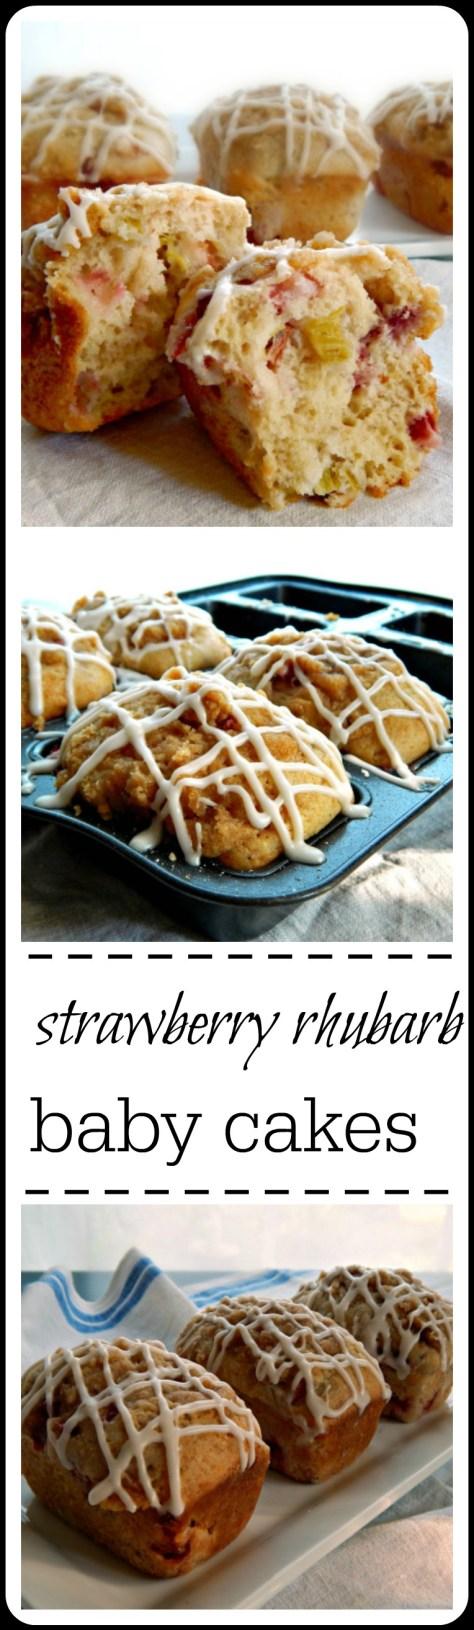 strawberry rhubarb babycakes